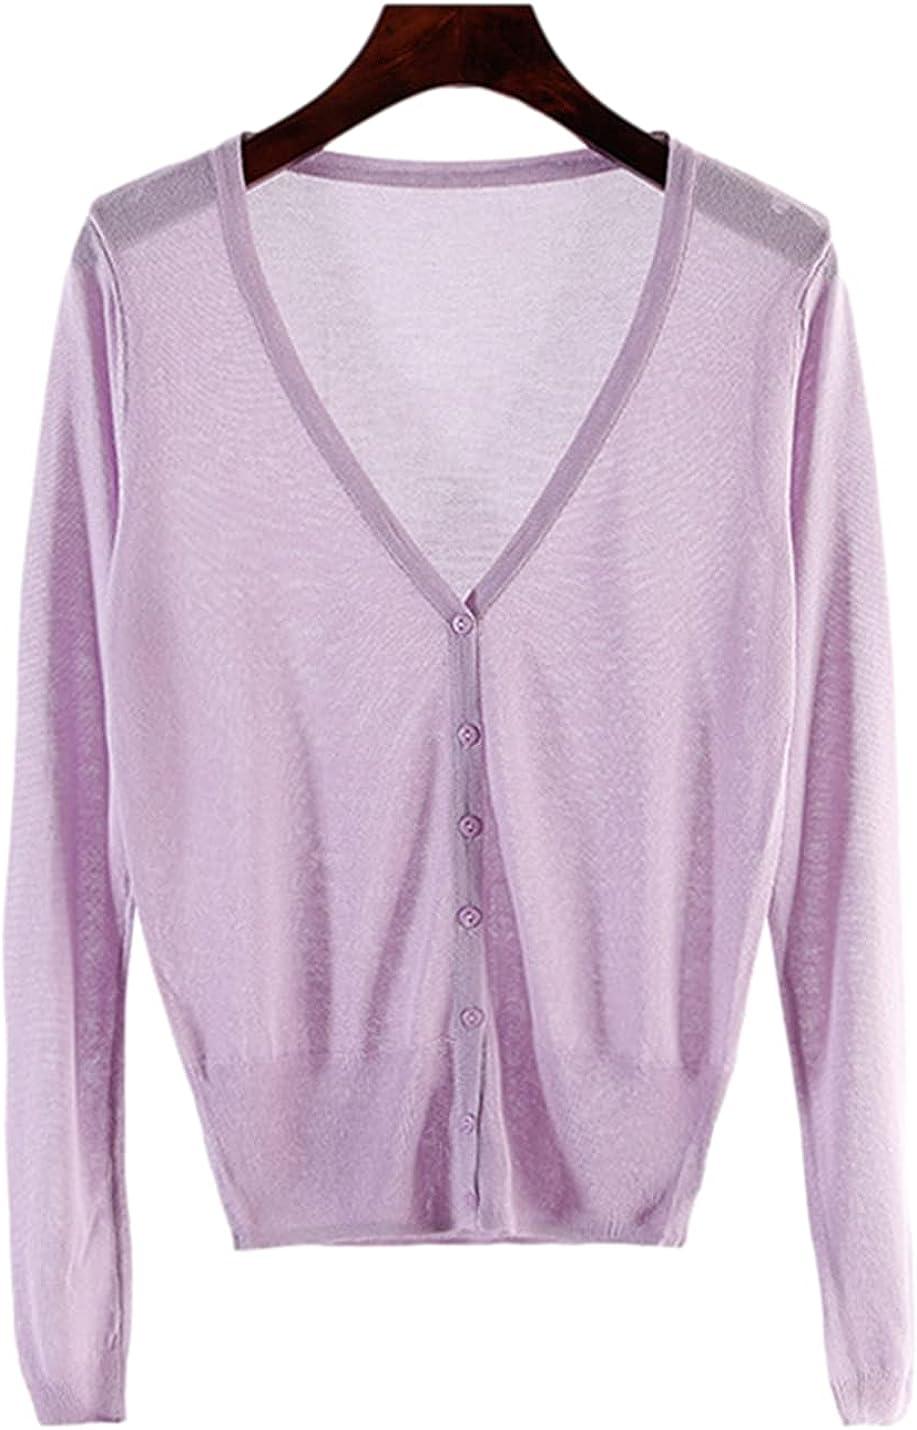 SeekMe Women's Long Sleeve Bolero Regular store Button Shrug Directly managed store Lightweight Down